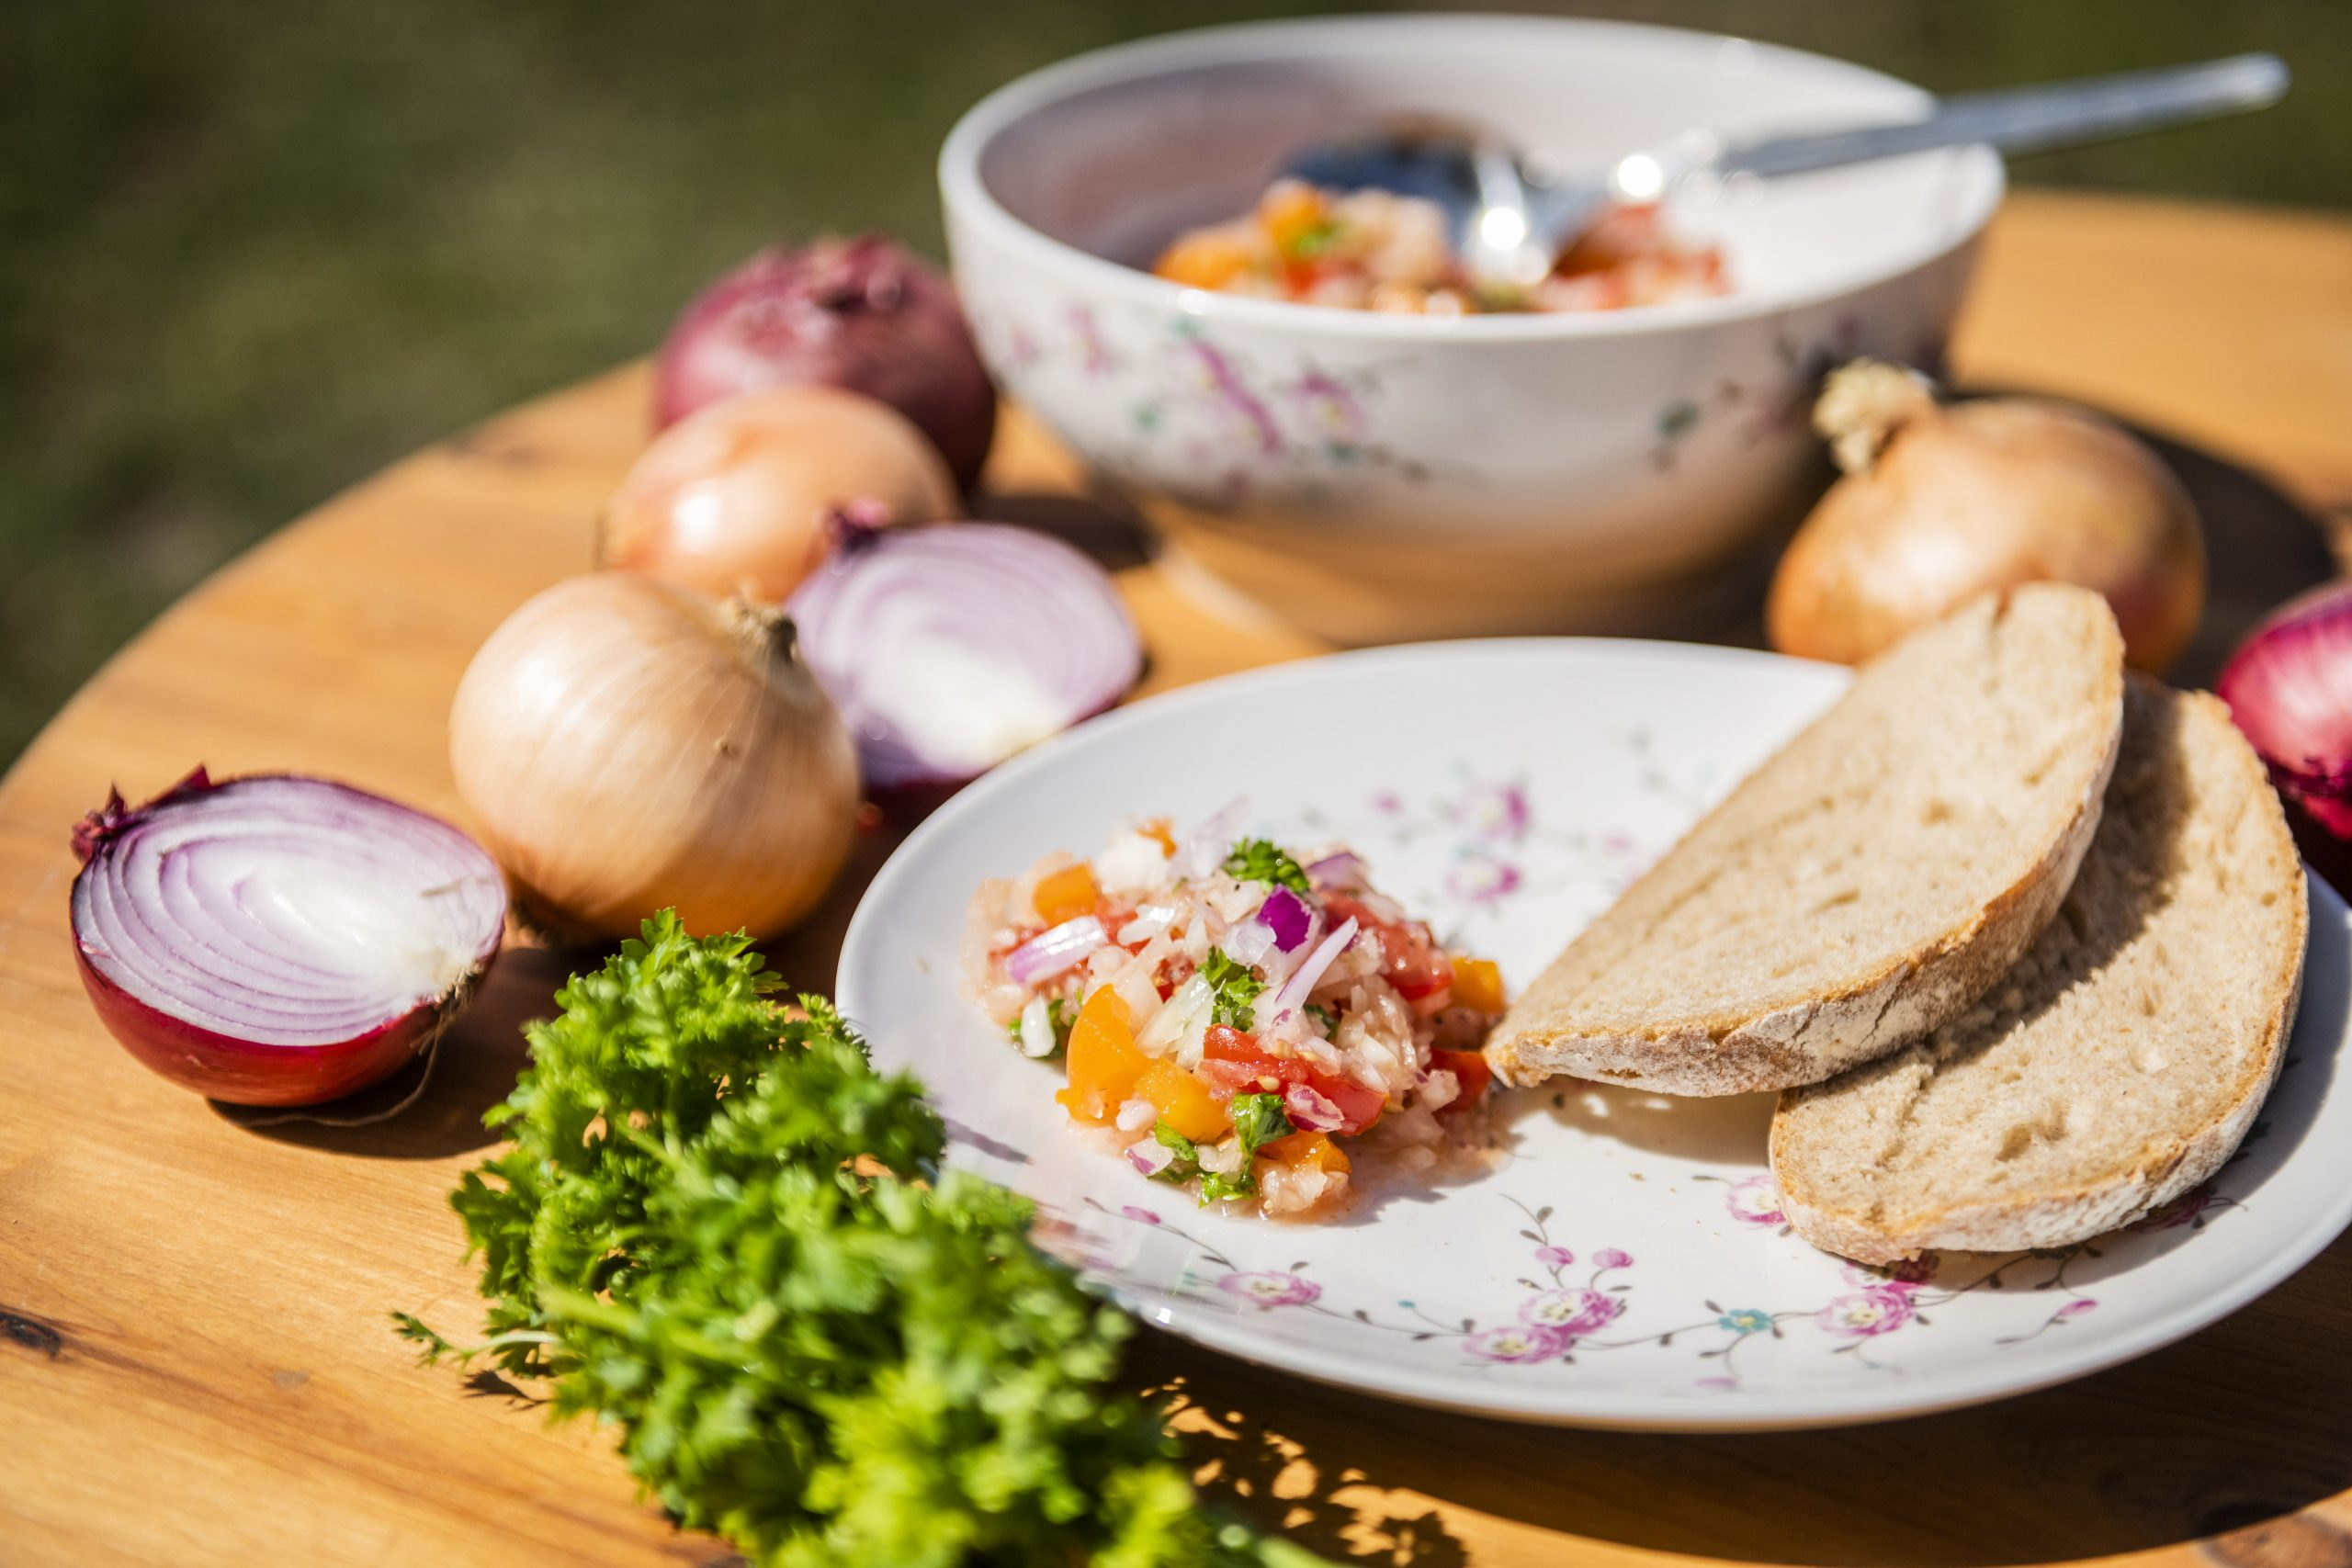 Zwiebelsalat auf dem Teller